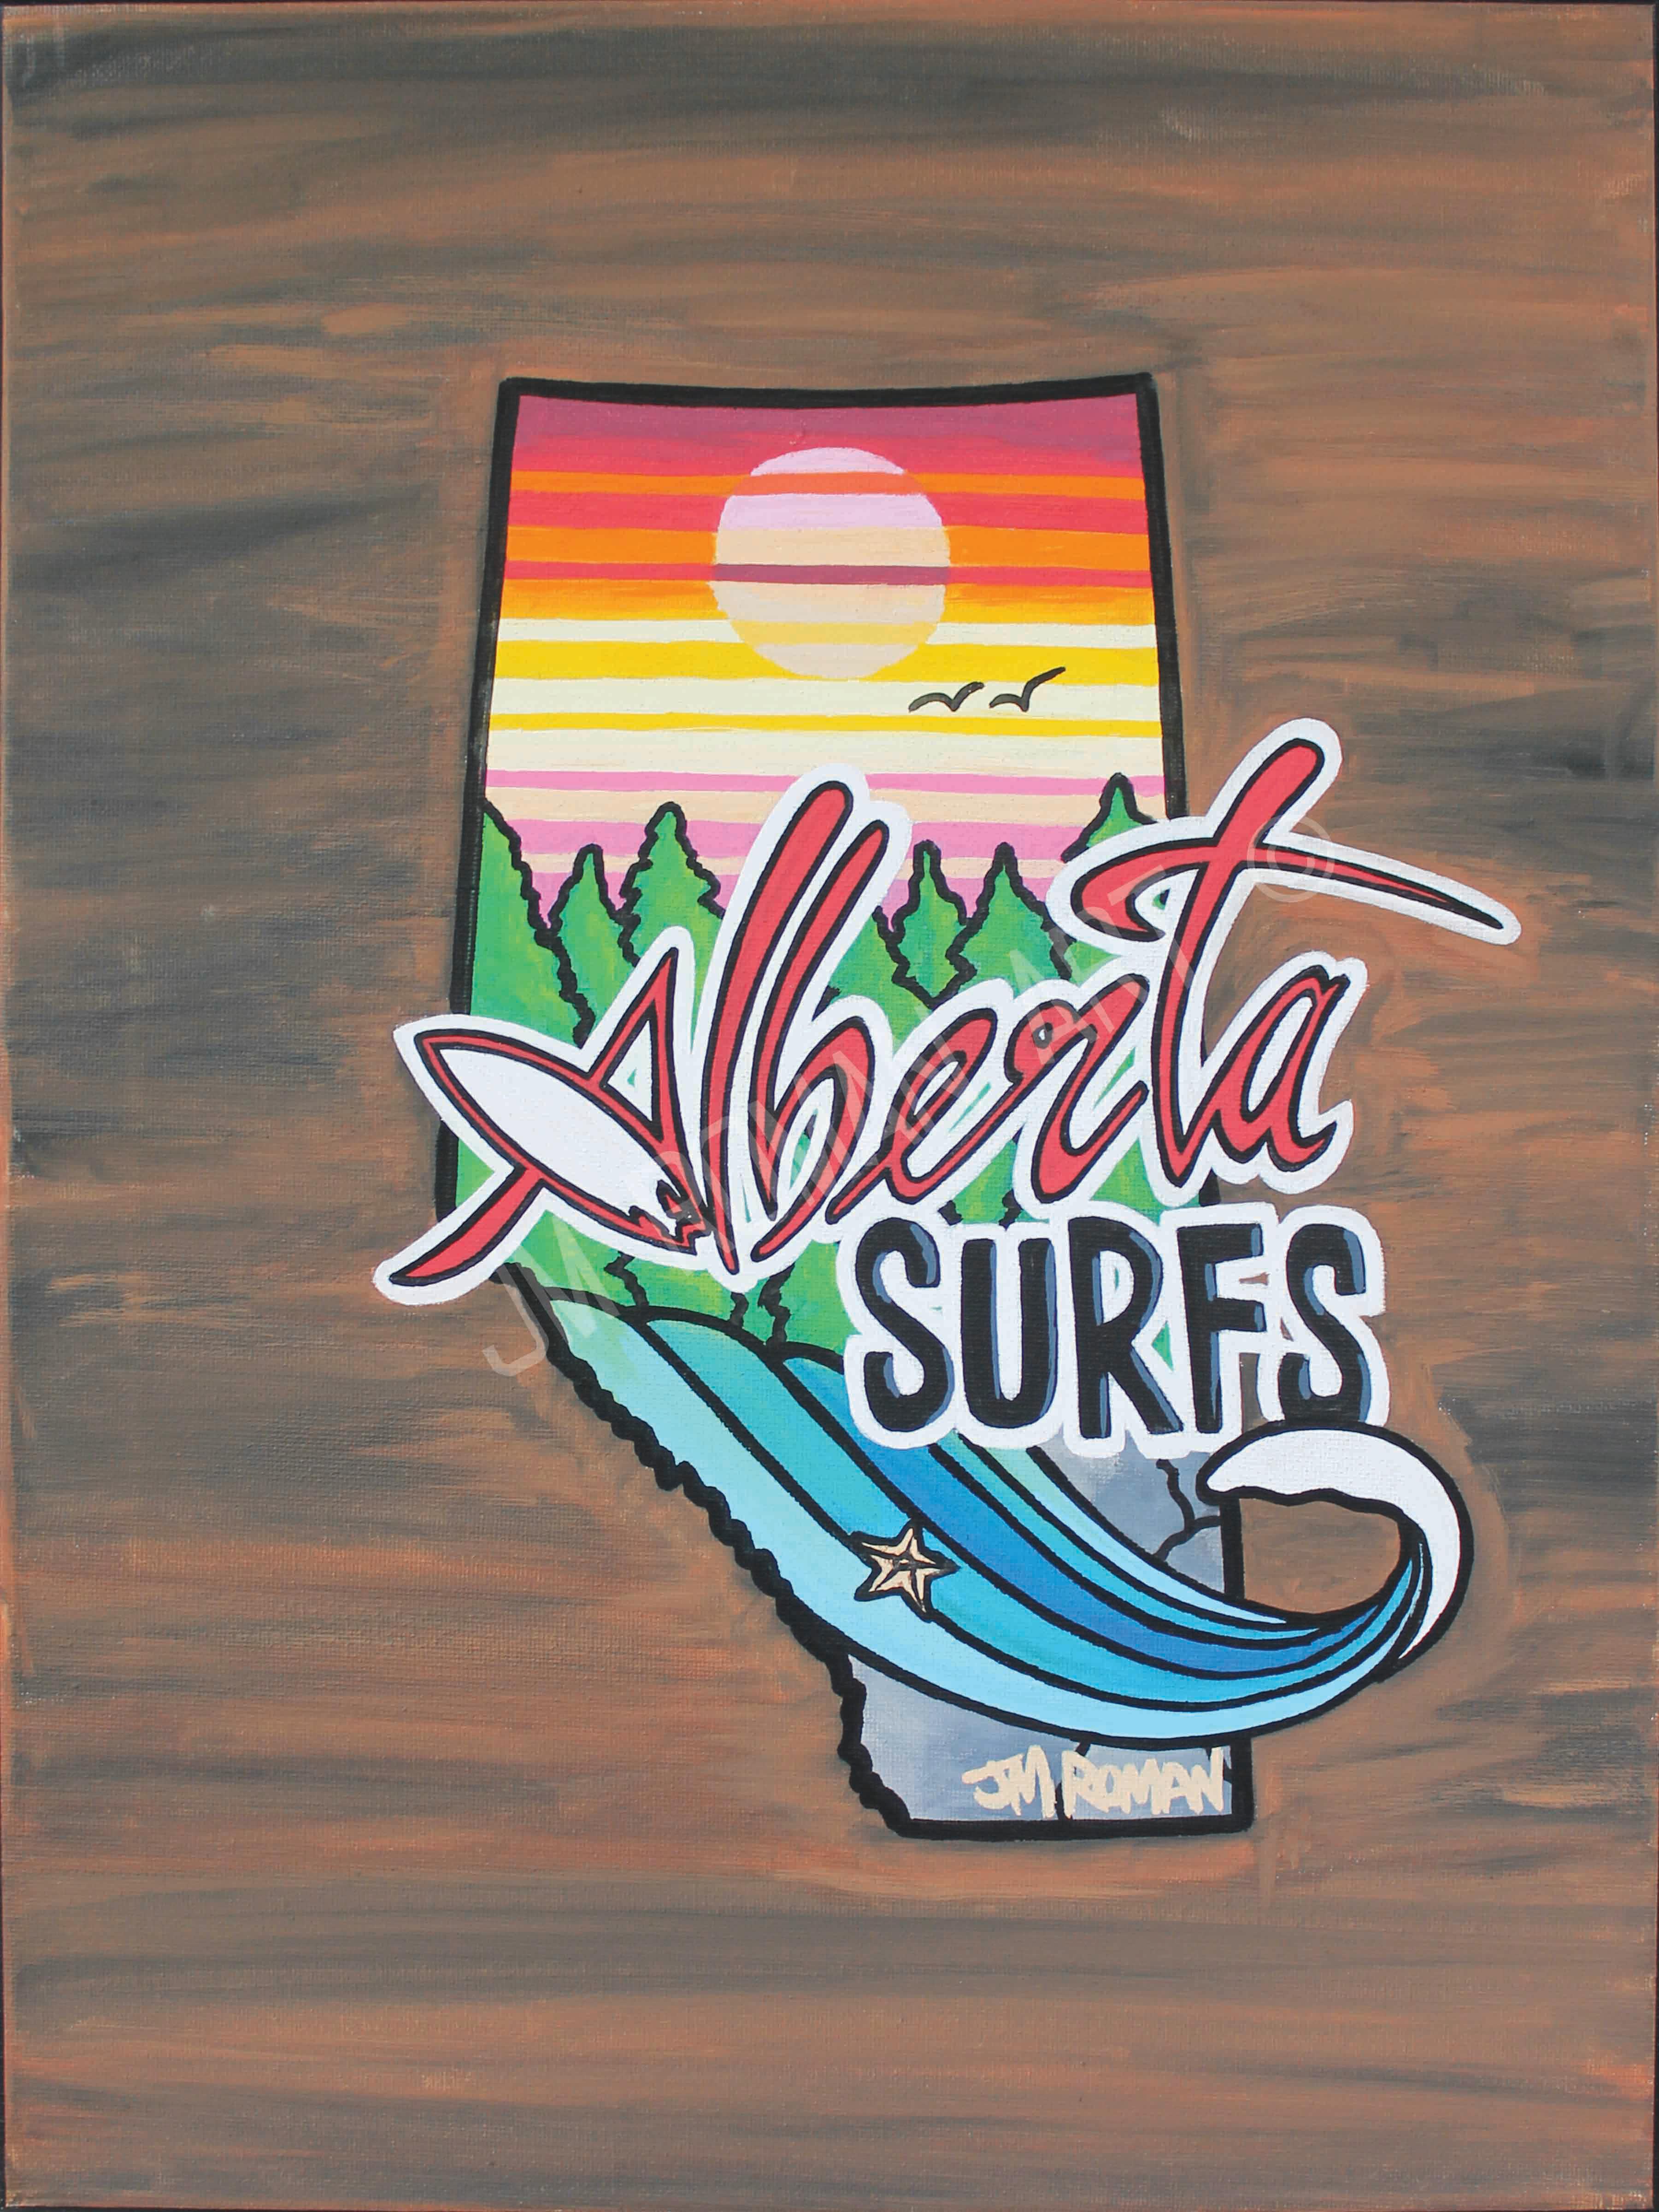 12 x 16 Alberta Surfs